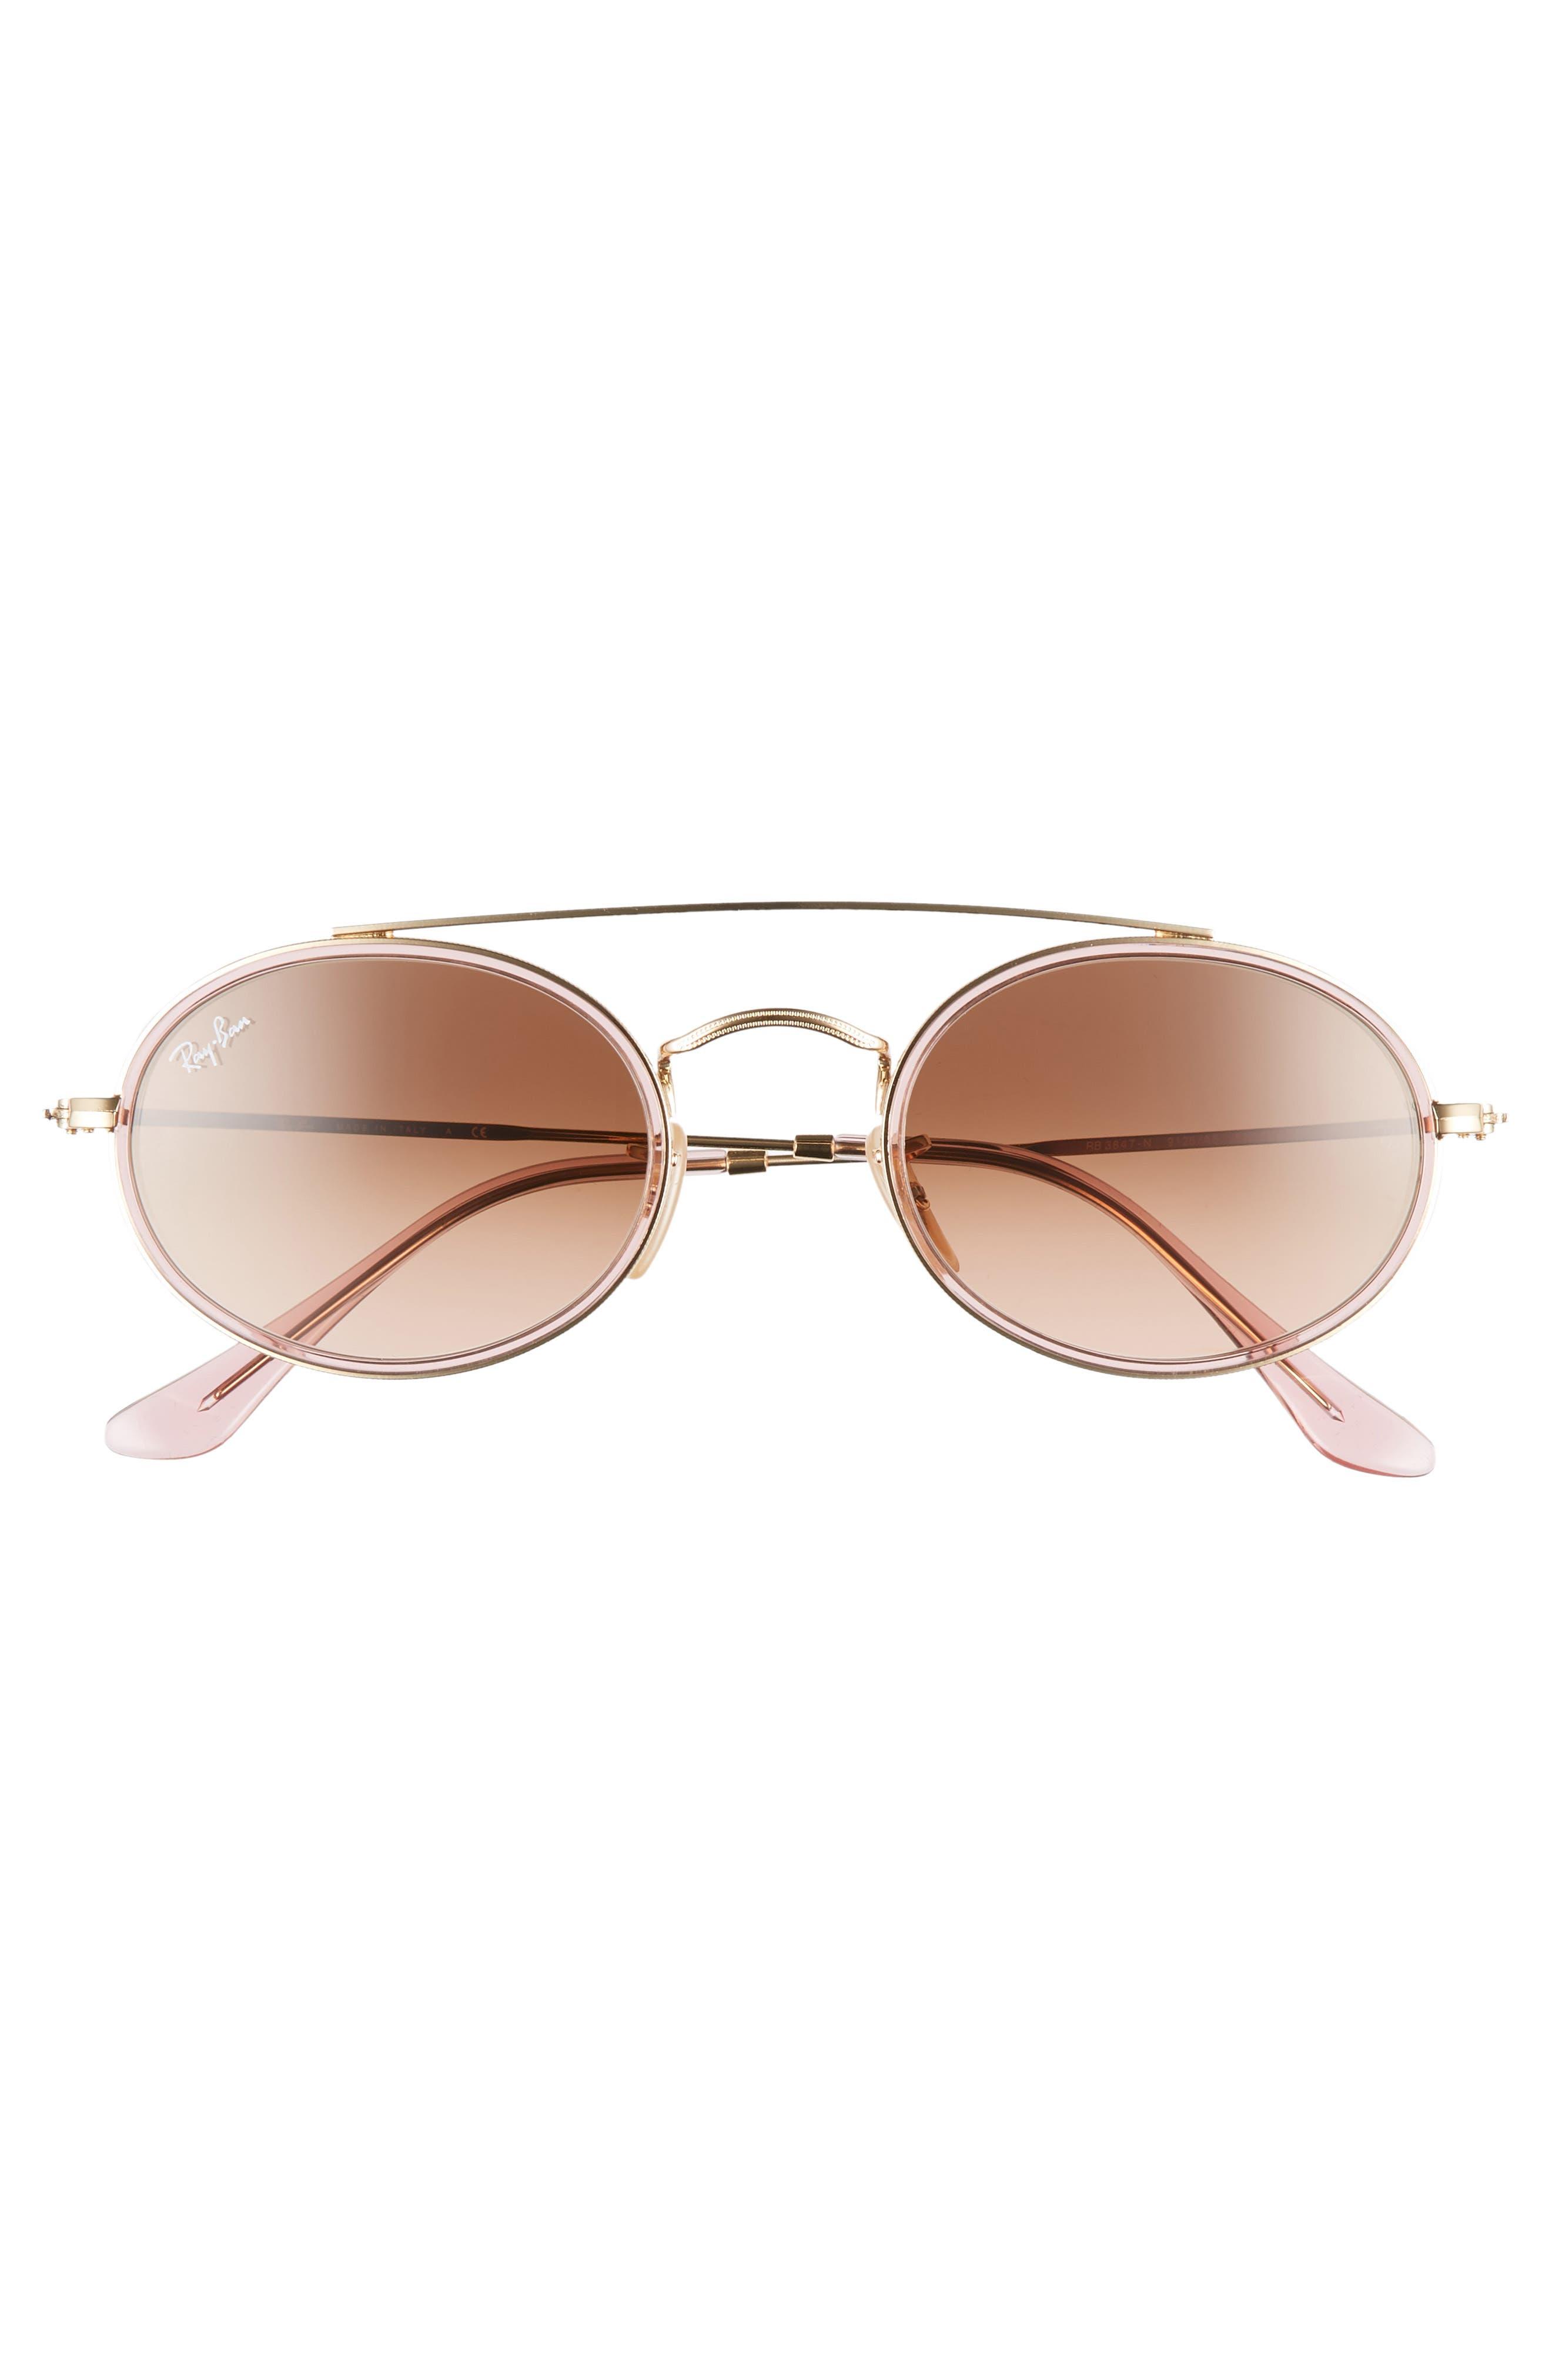 Elite 52mm Gradient Oval Sunglasses,                             Alternate thumbnail 3, color,                             712